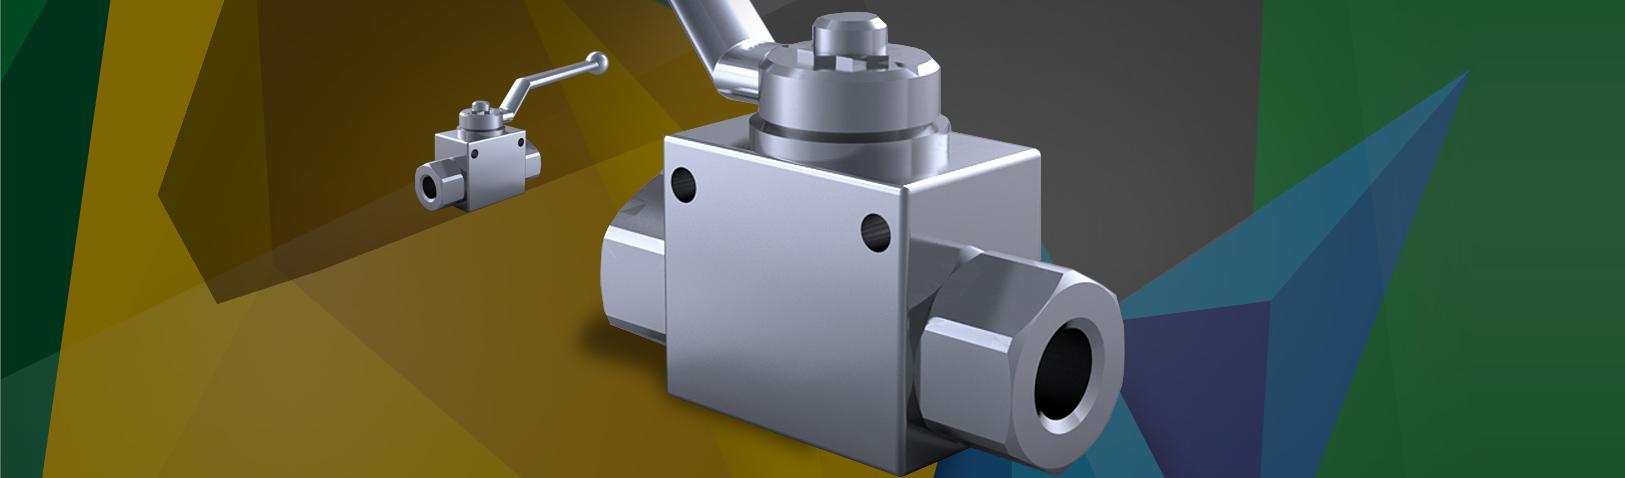 ball-valves_875703